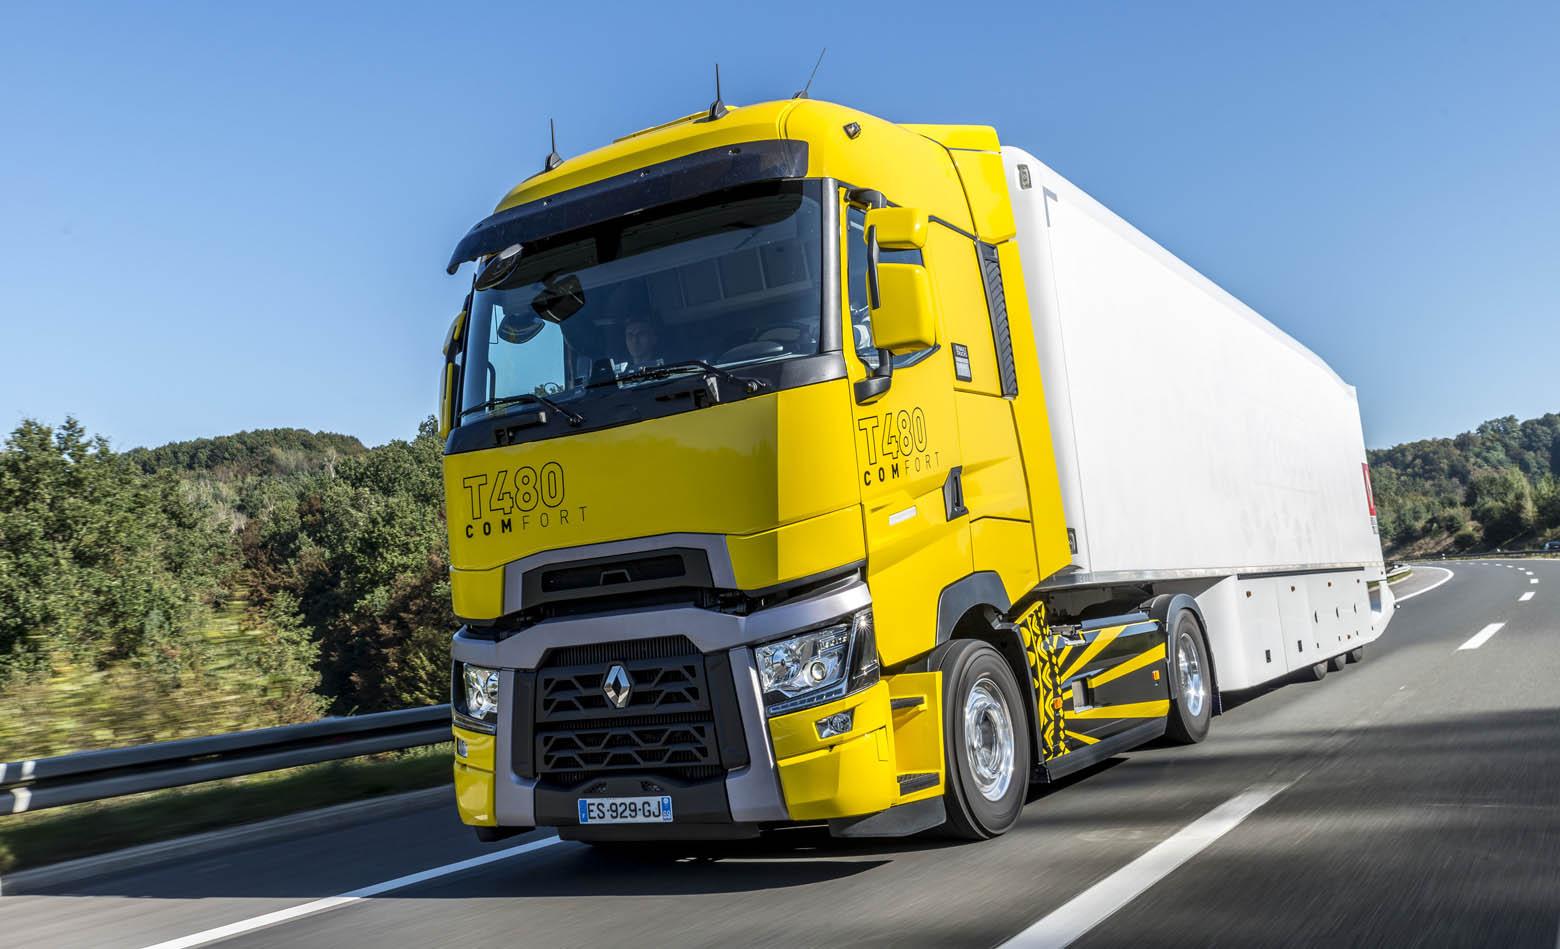 Facebook stranica Renault Trucks Hrvatska